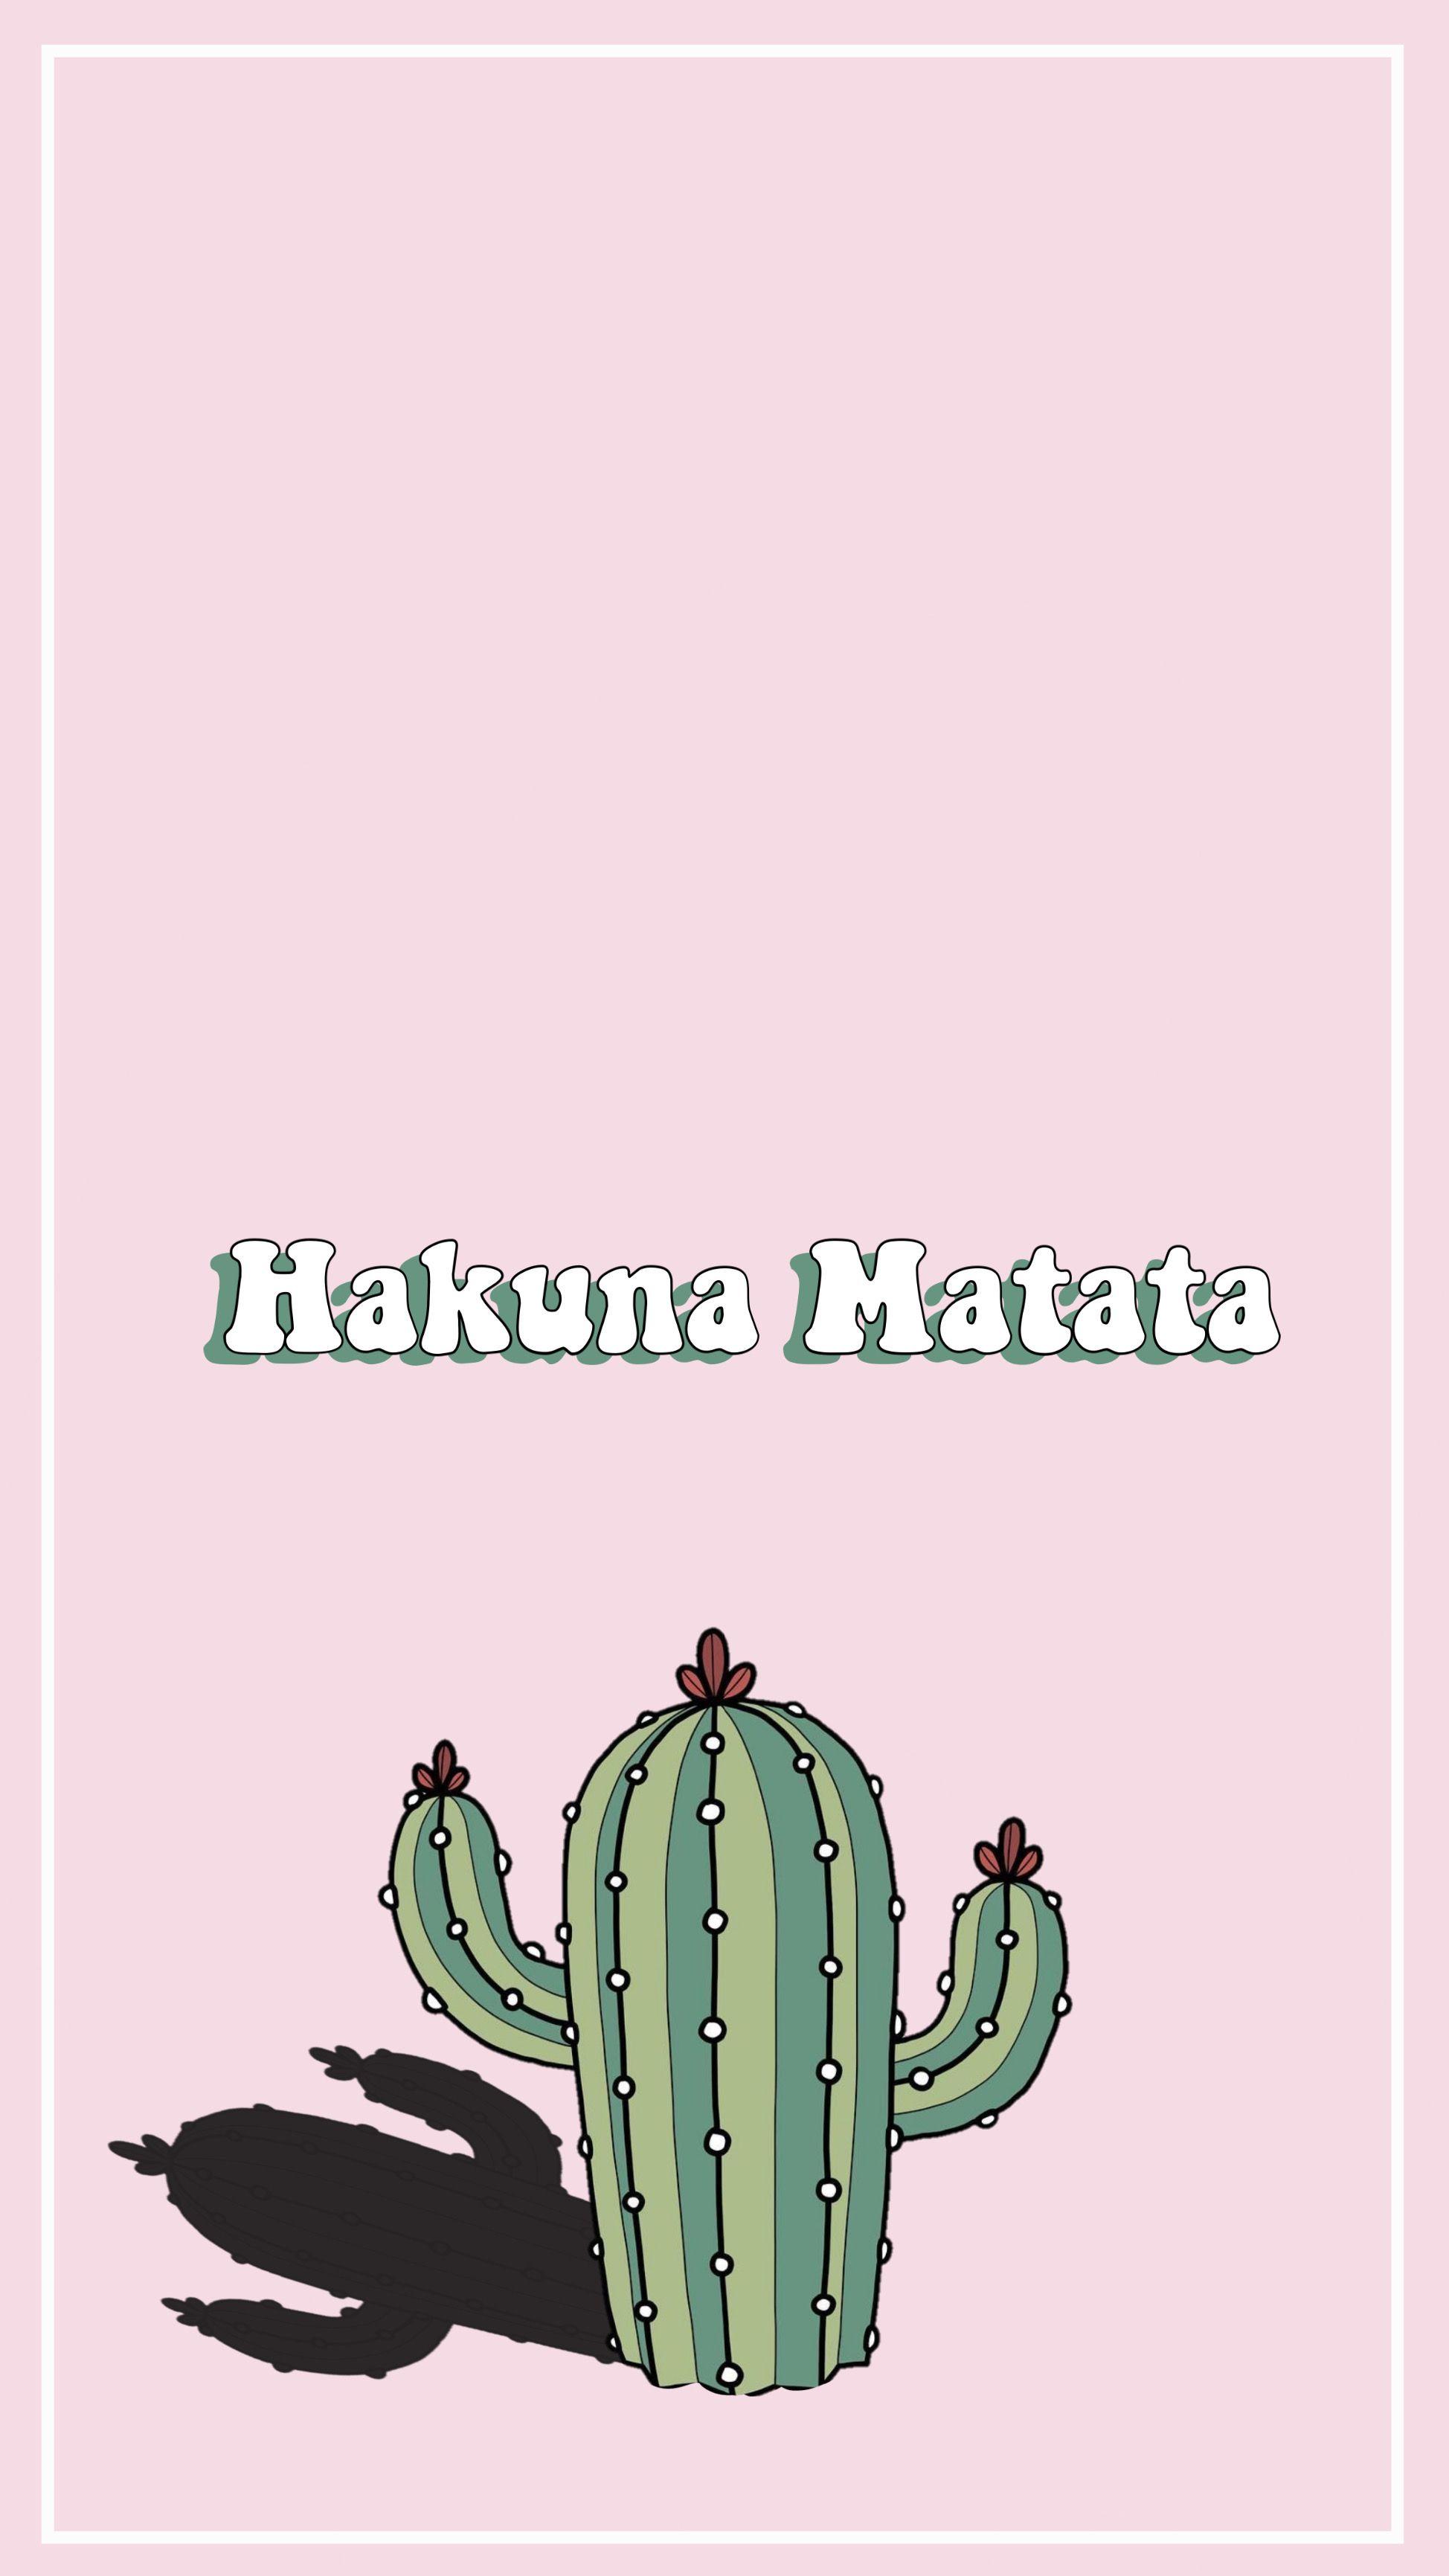 Aesthetic Lockscreen Wallpaper Hakuna Matata Hakuna Matata Hakuna Wallpaper